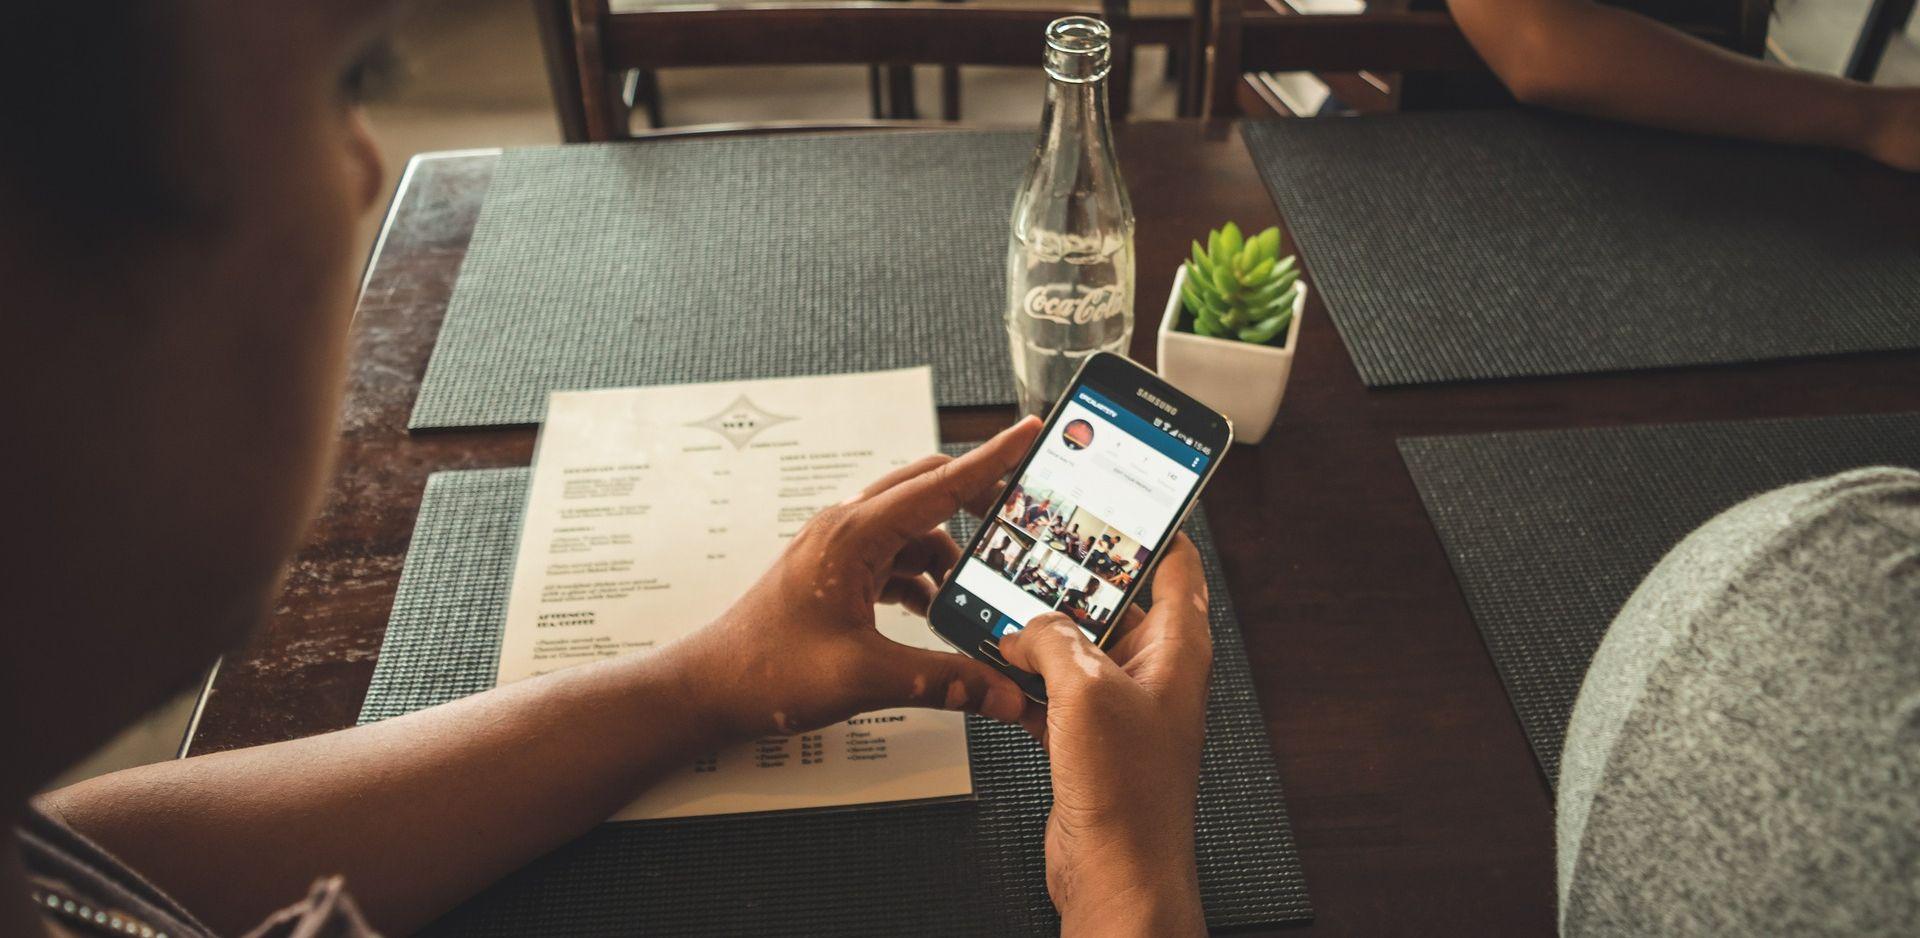 Instagram uveo horizontalne i vertikalne fotke i videa